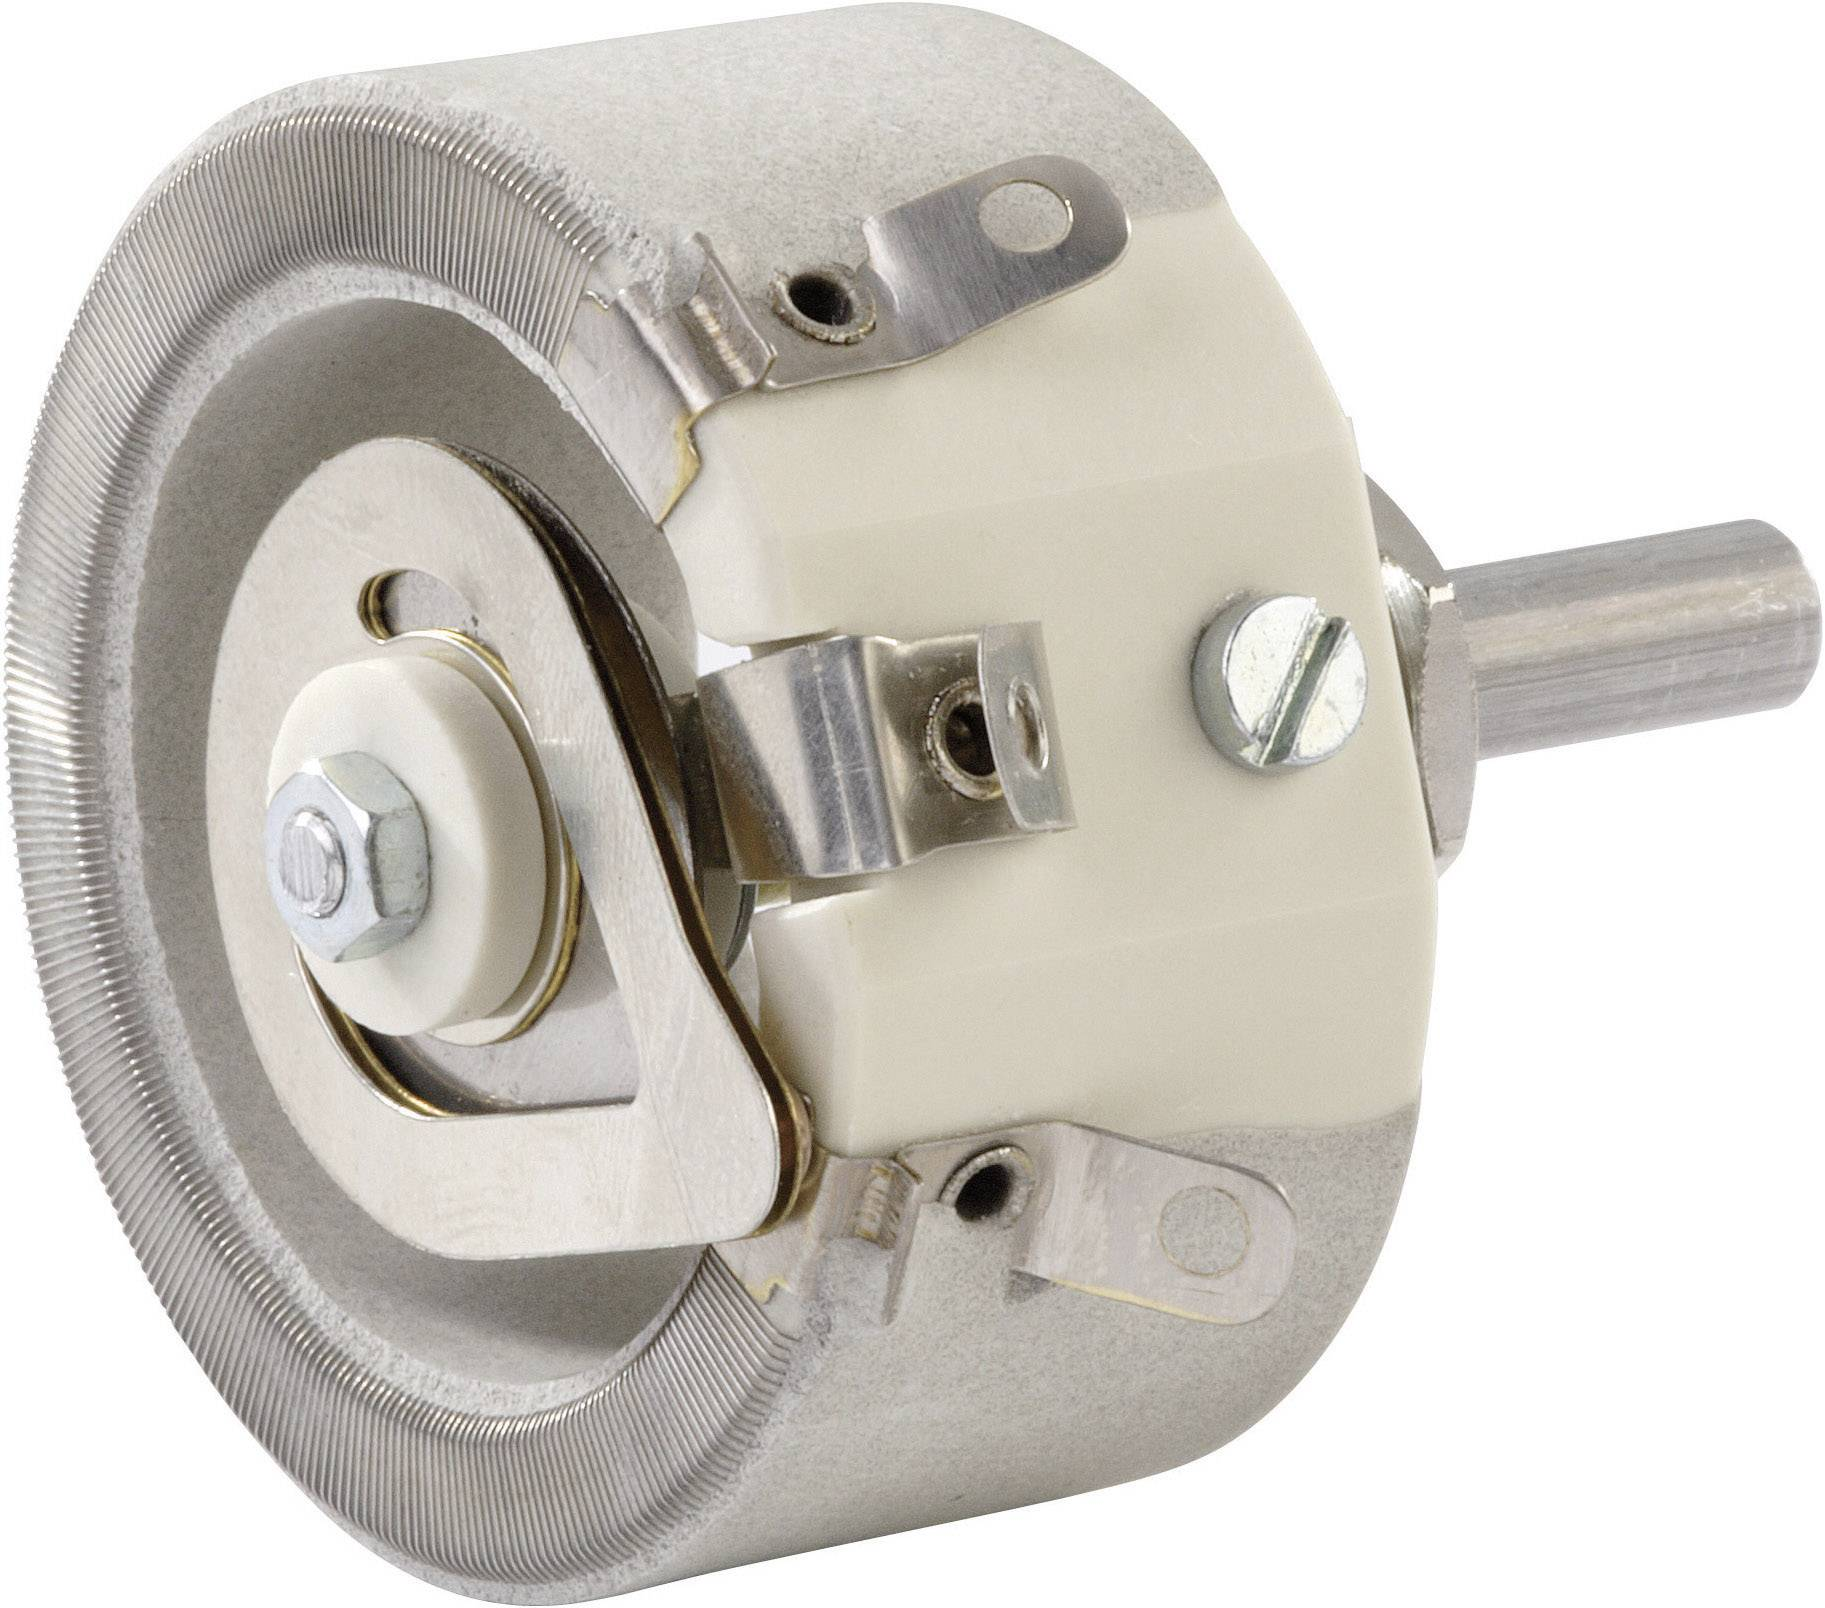 Drôtový potenciometer mono TT Electronics AB 3191006900 3191006900, 10 W, 4.7 kOhm, 1 ks